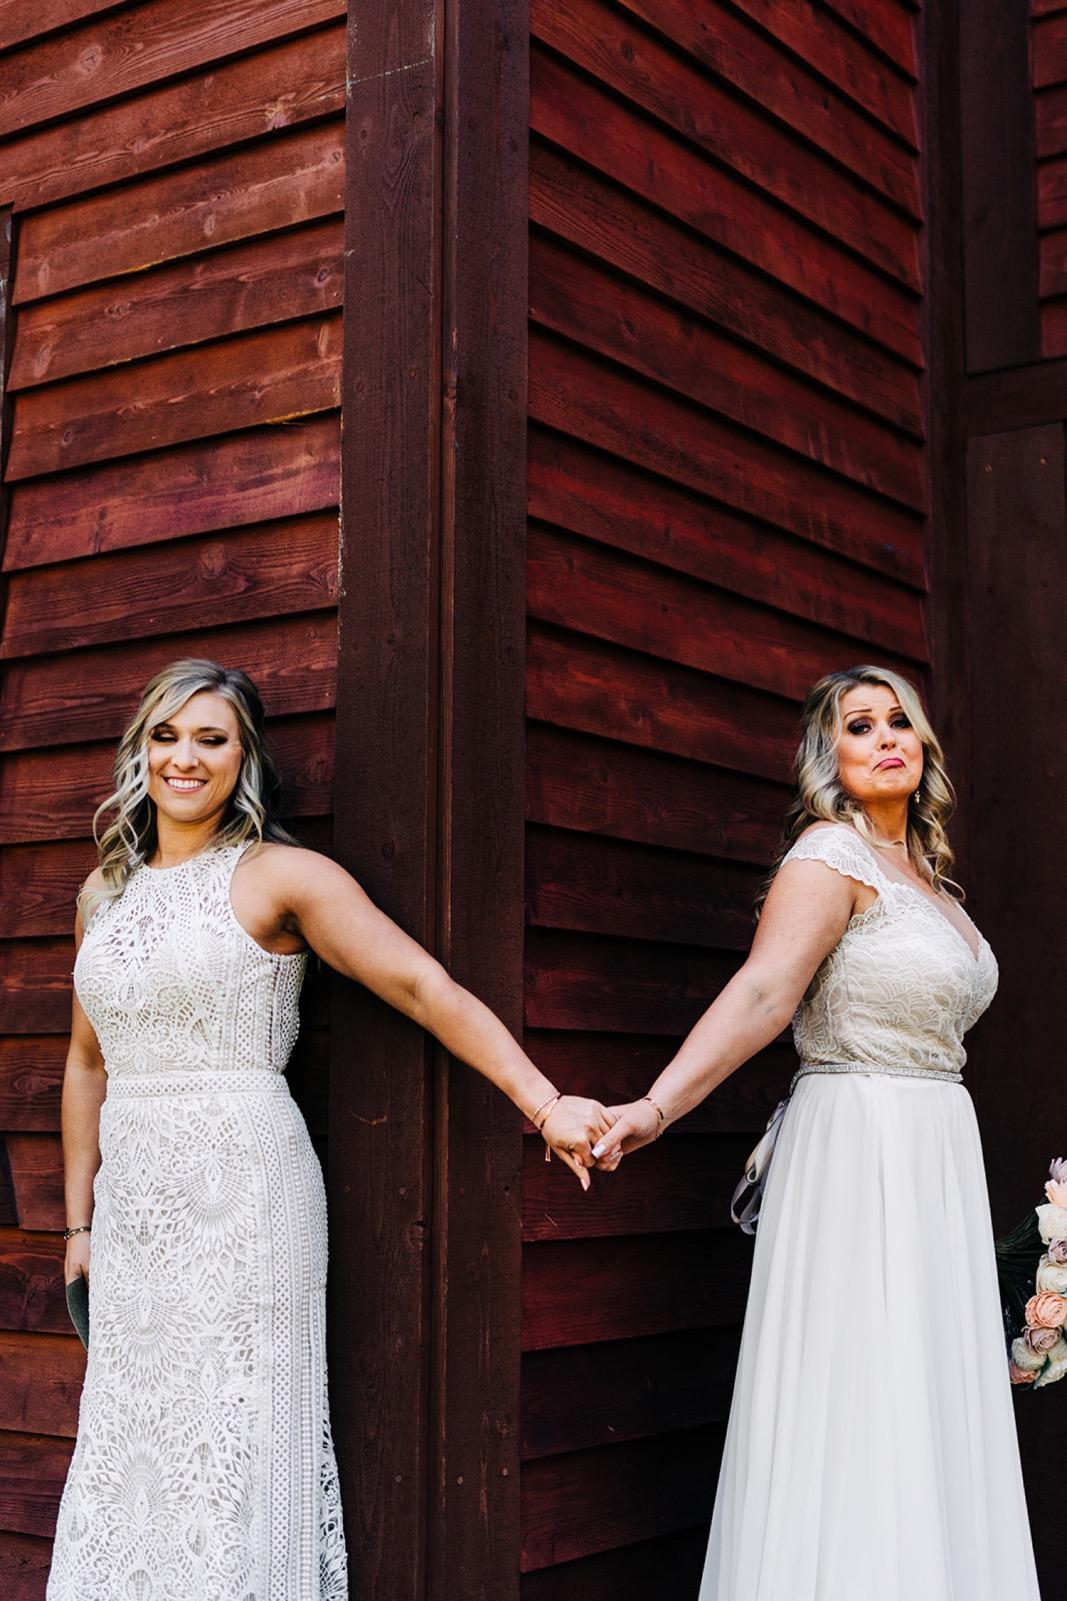 043_falissa_heather_wedding-115.jpg